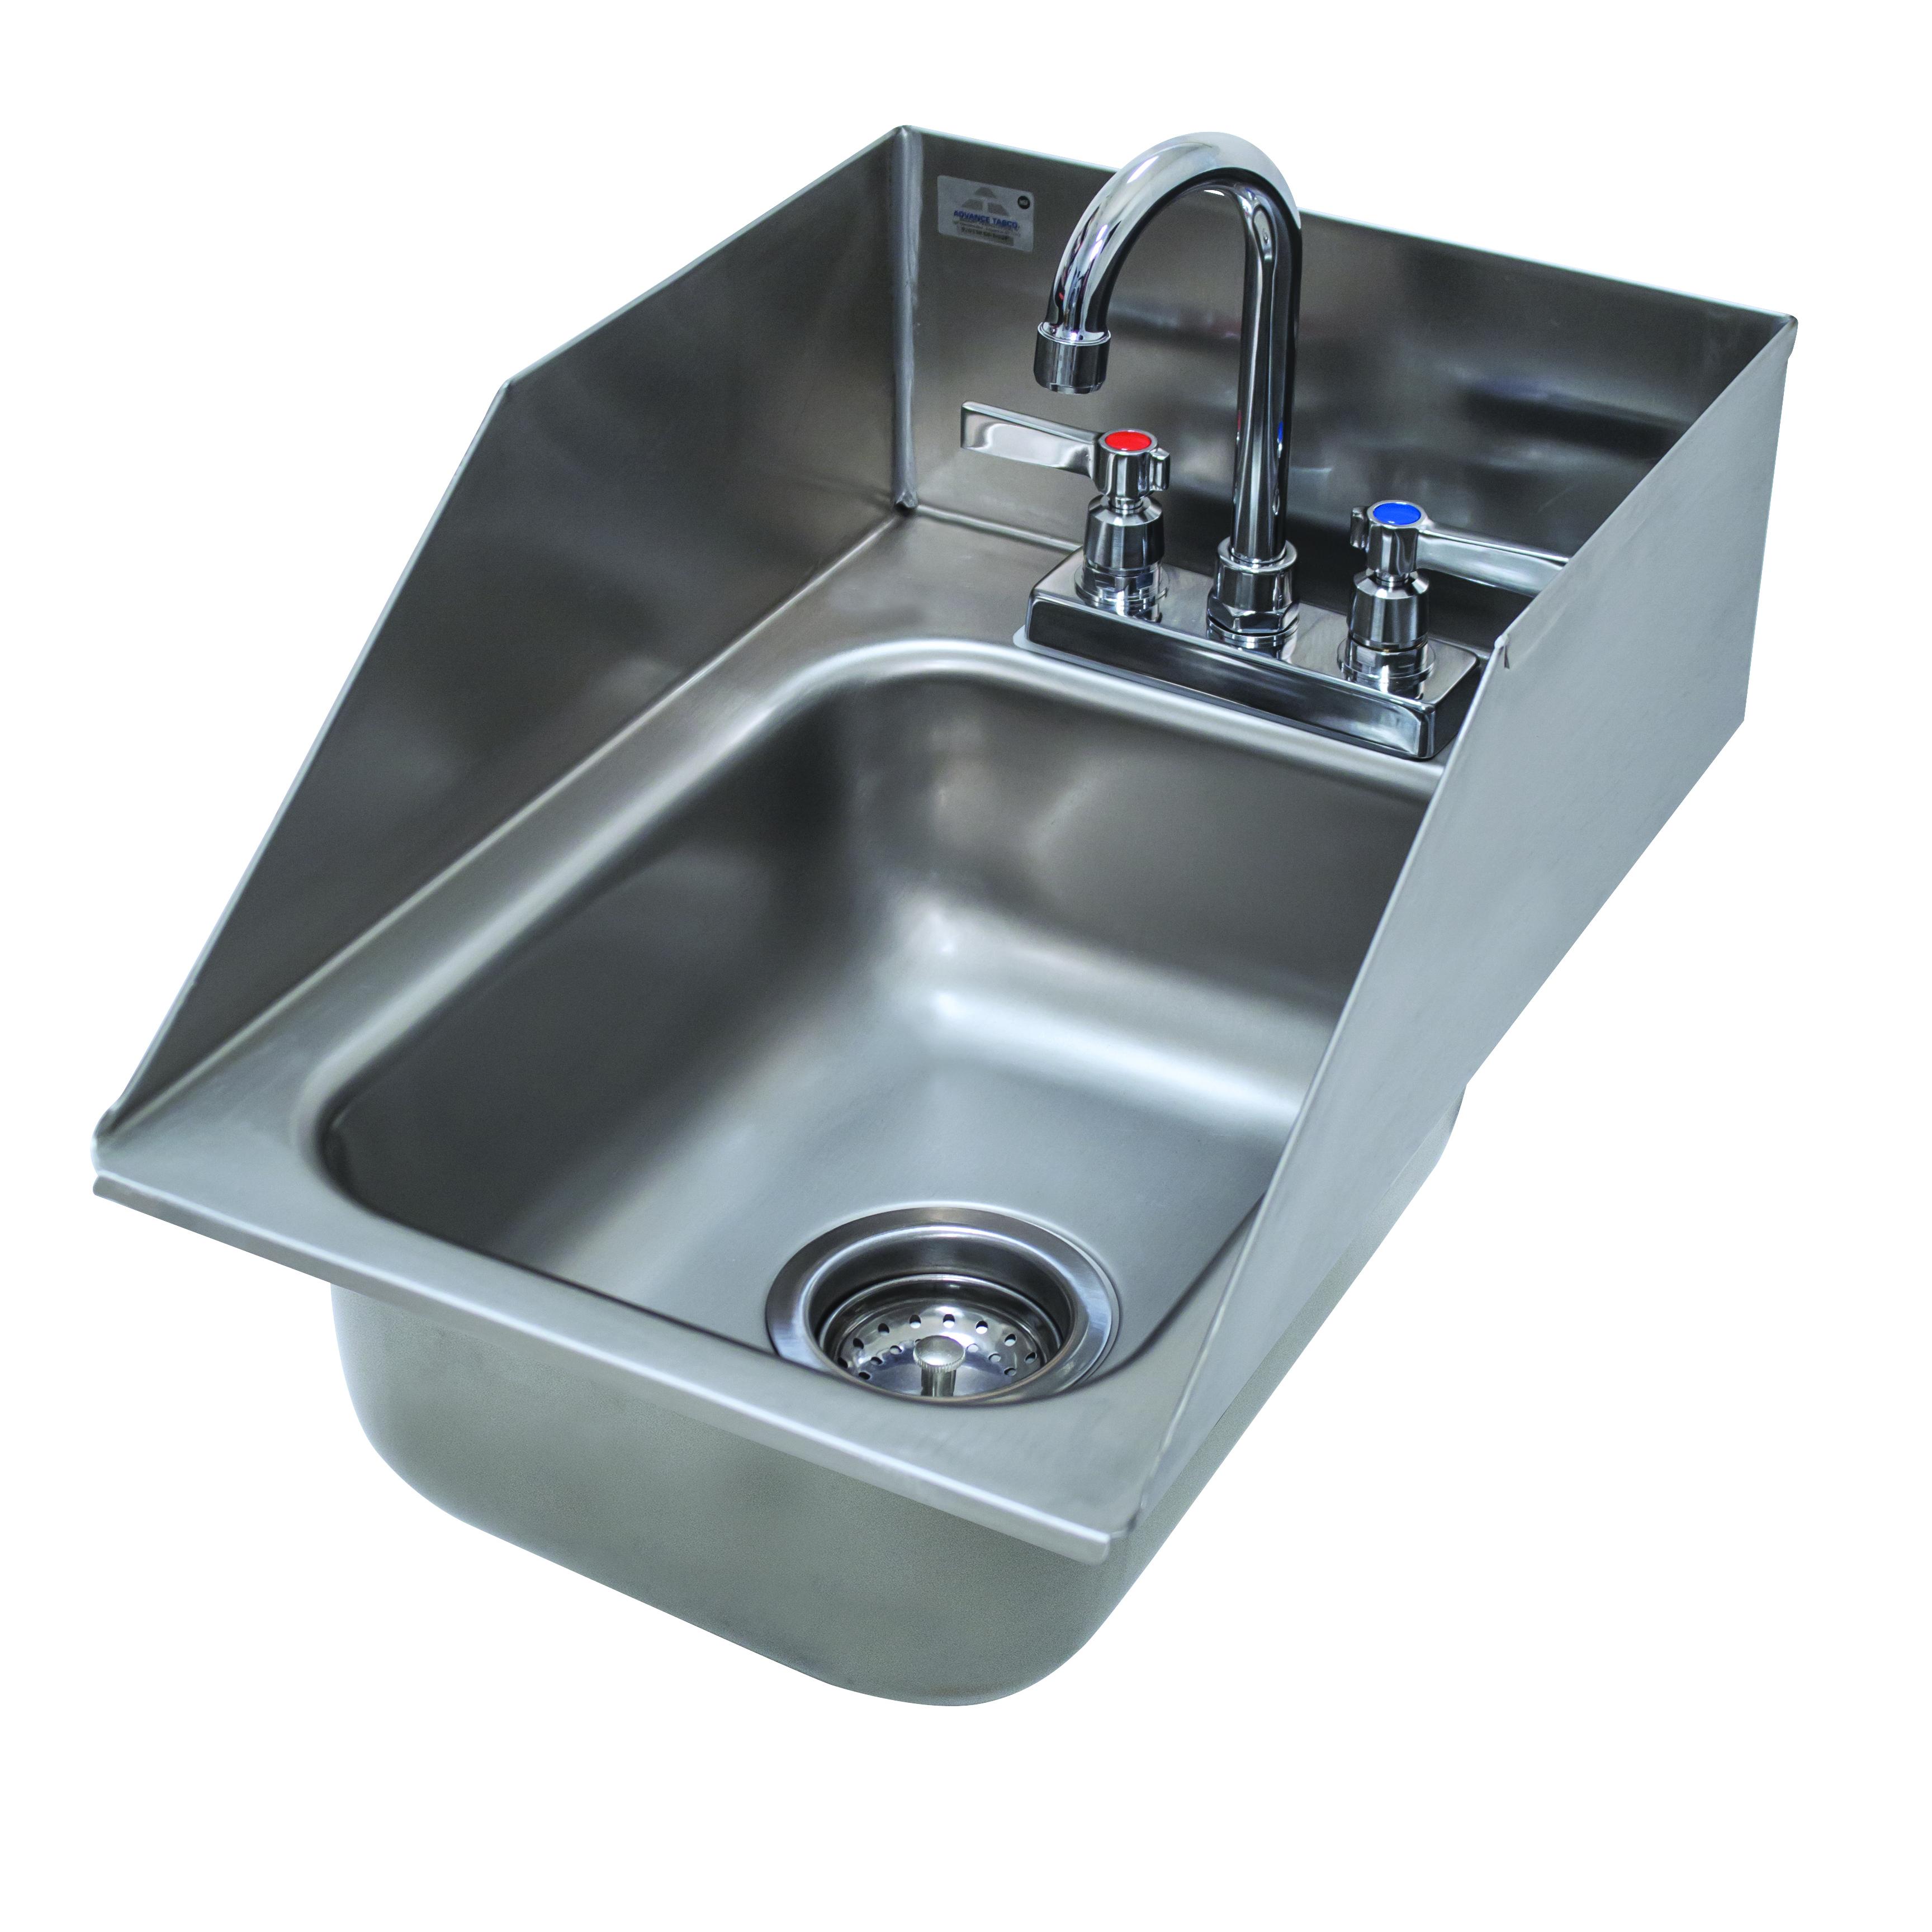 Advance Tabco DI-1-10SP-1X sink, drop-in